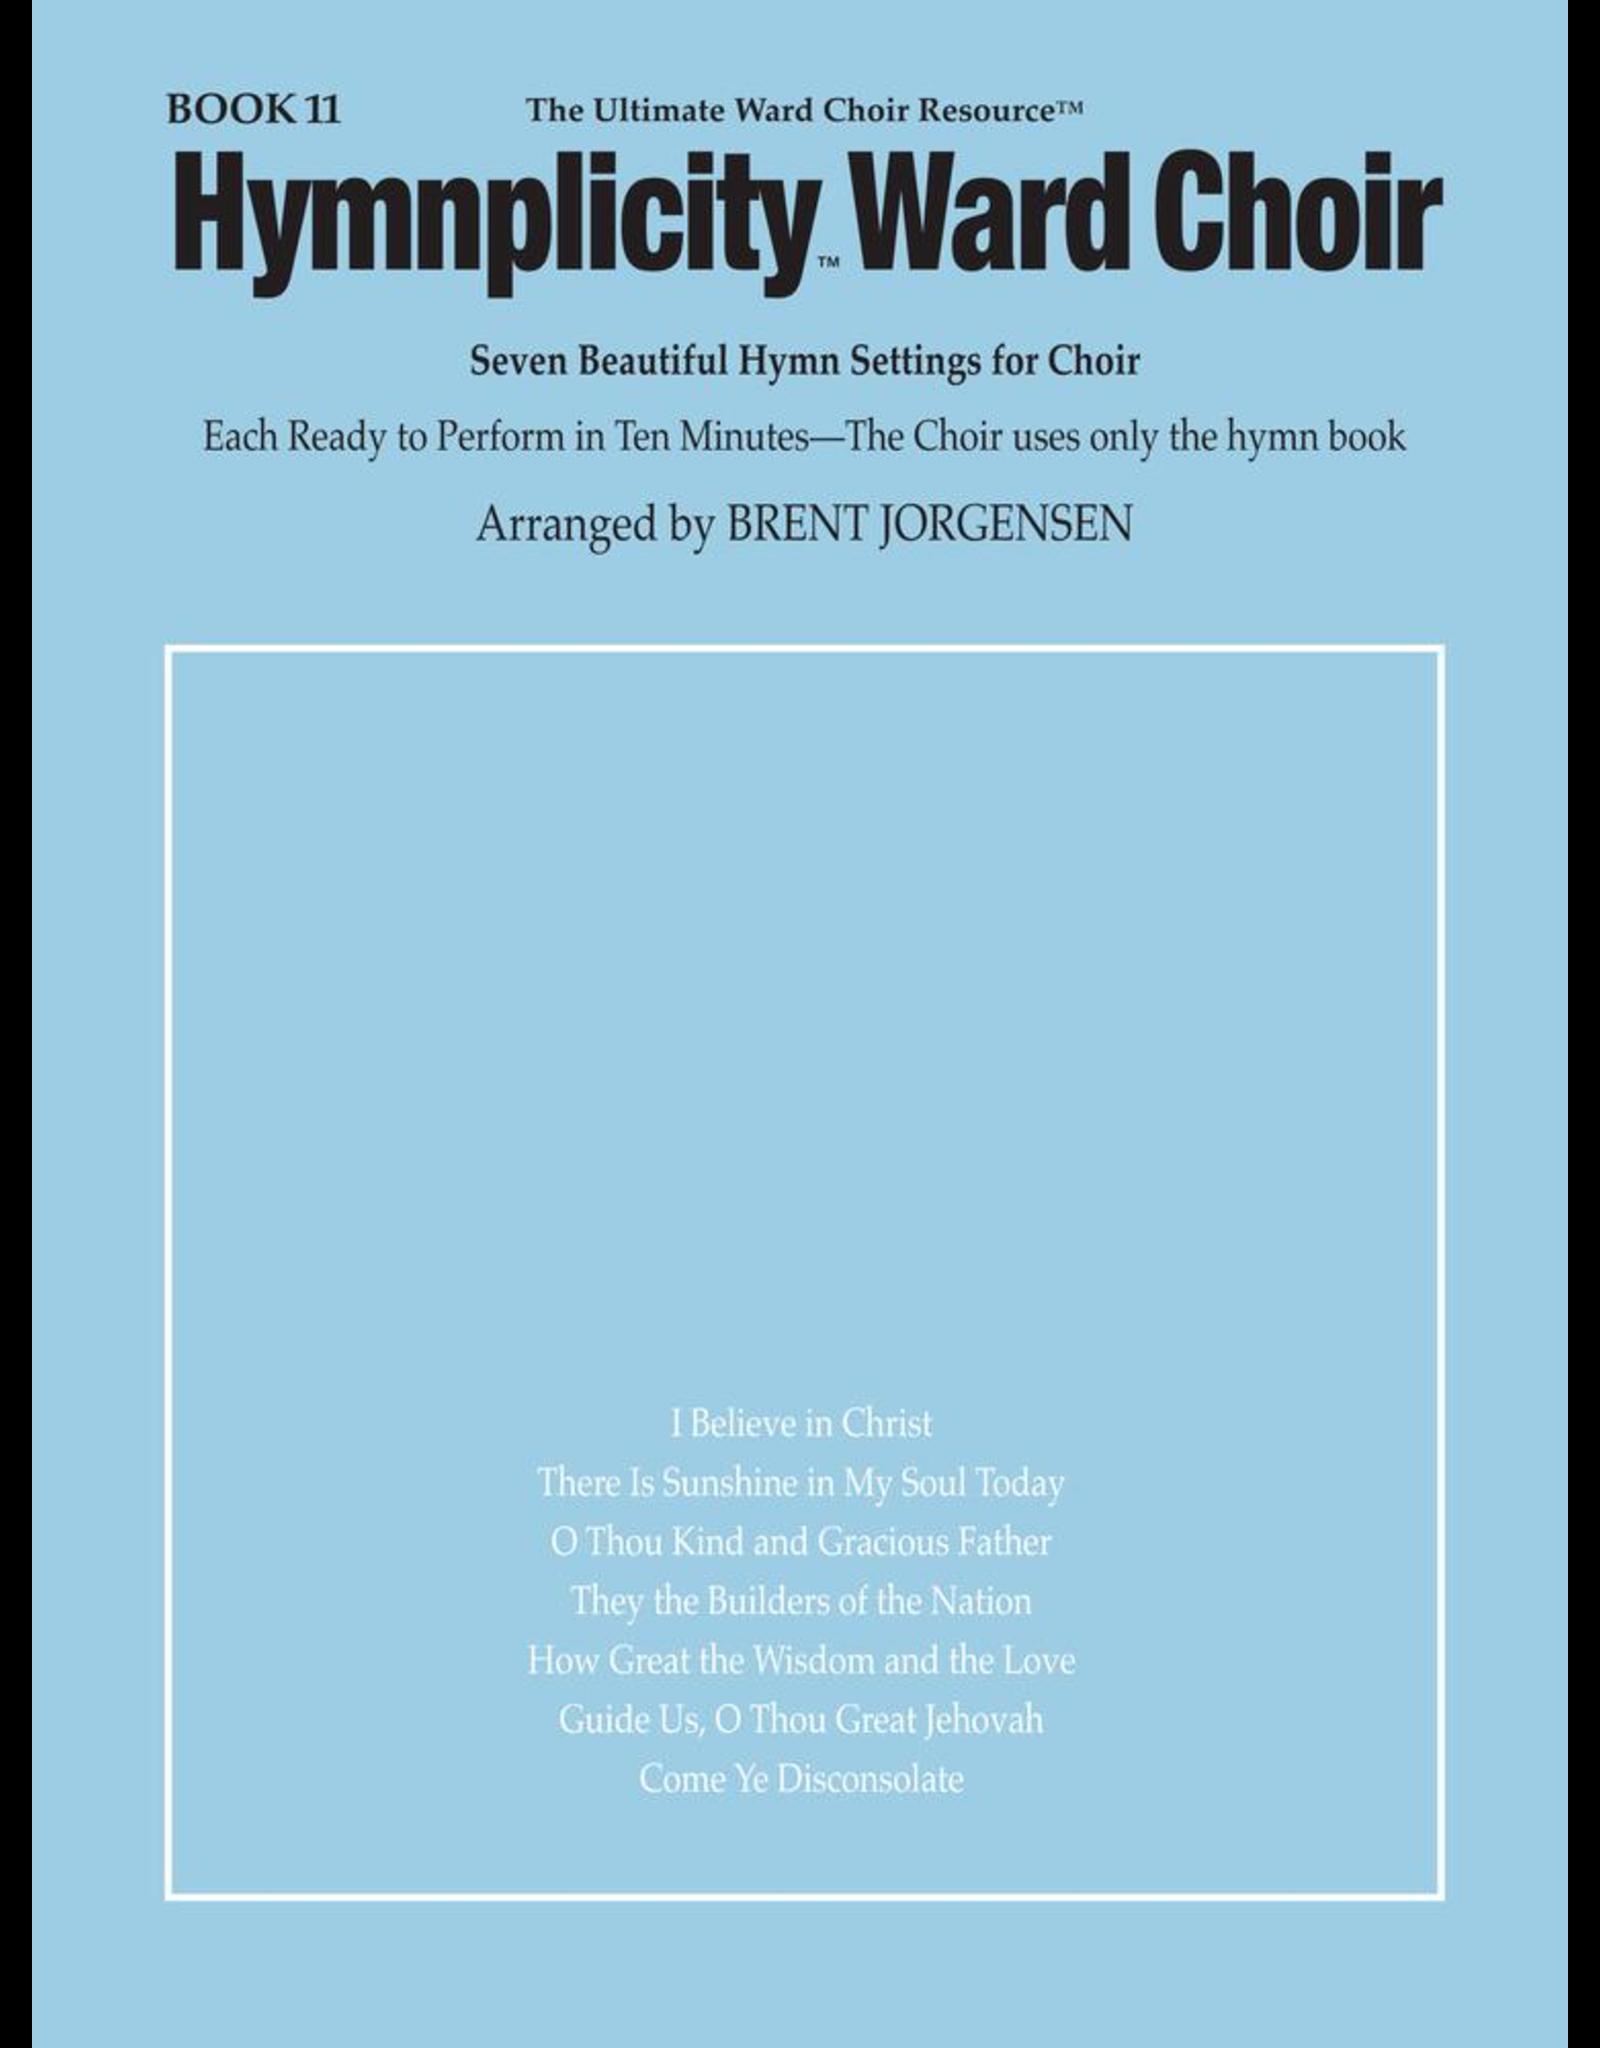 Jackman Music Hymnplicity Ward Choir, Book 11